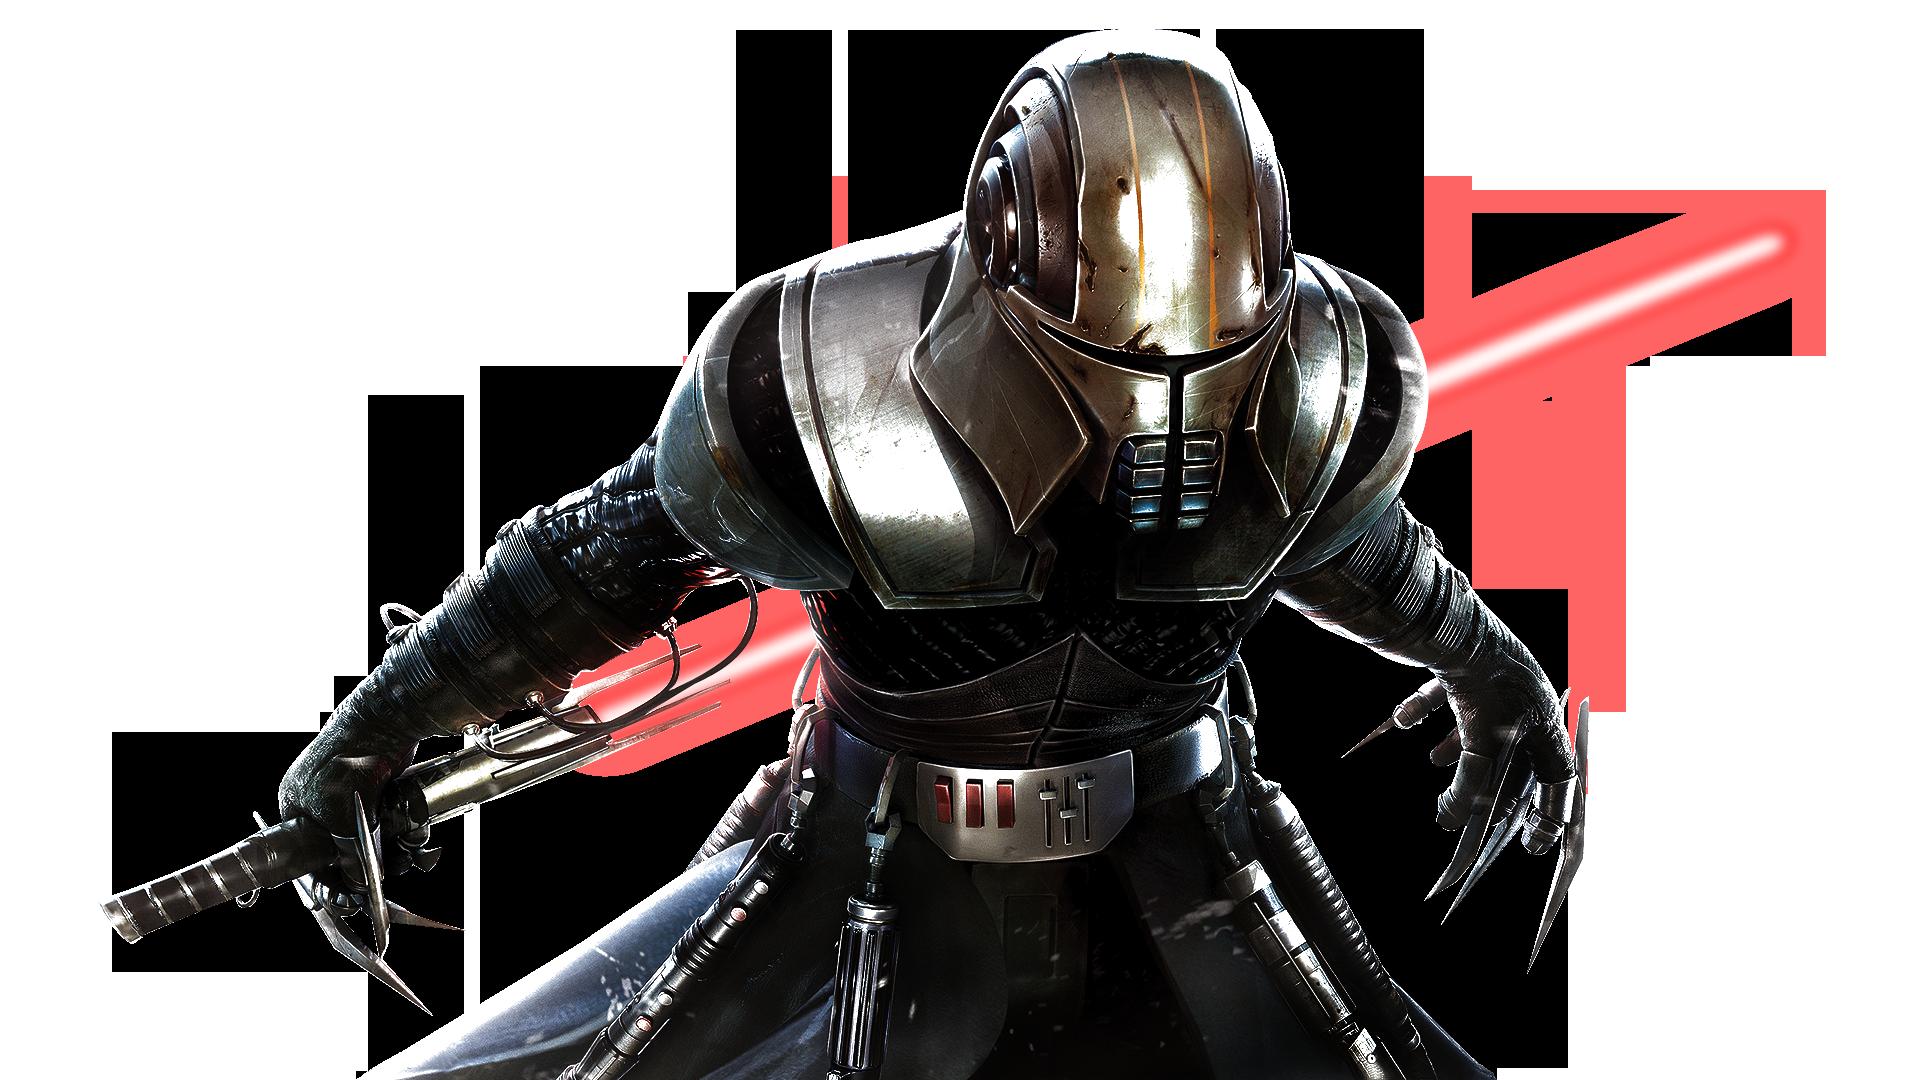 Download PNG image - Star Wars Darth Vader Vector Png